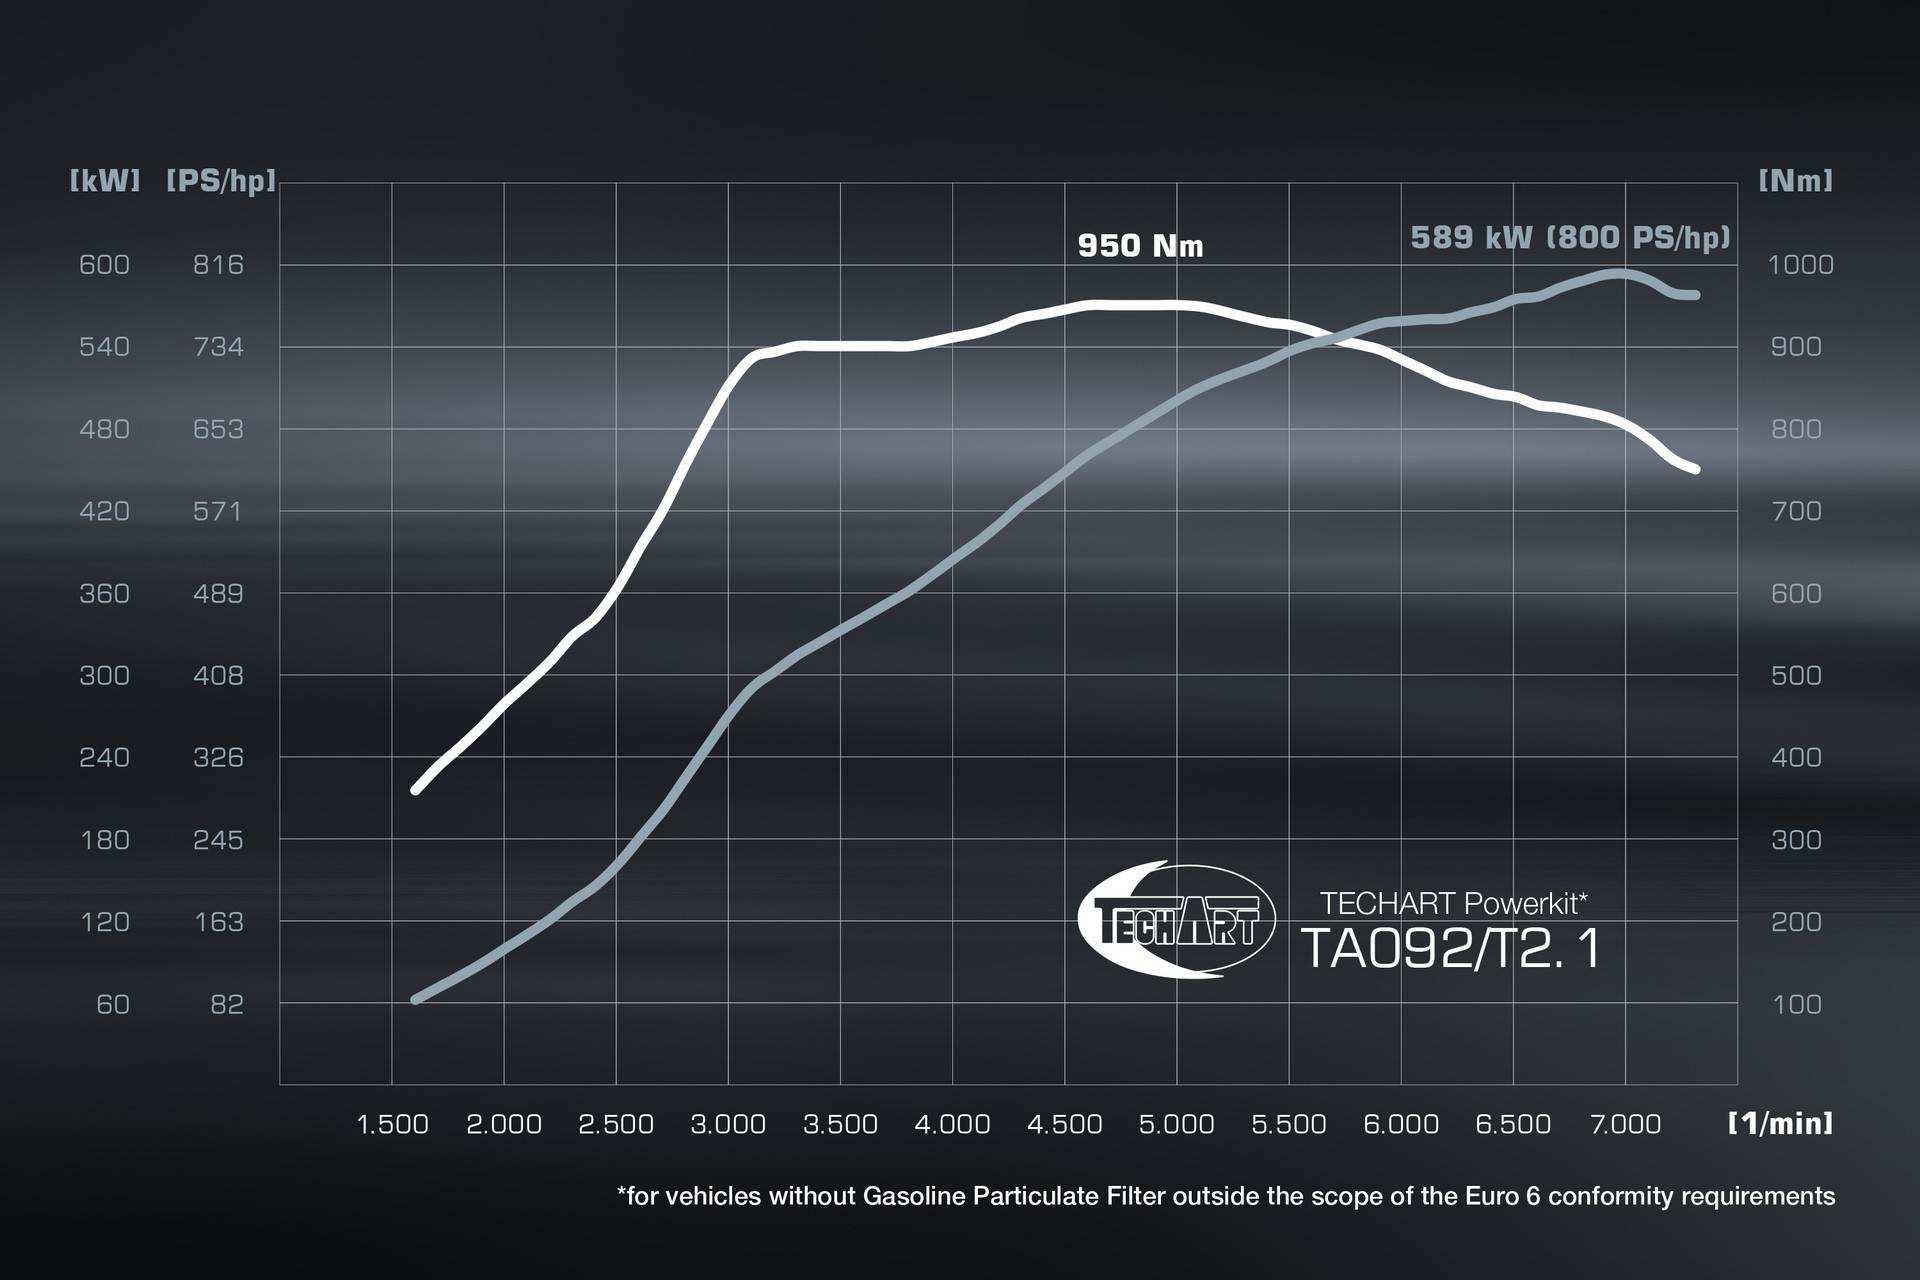 Techart_GTstreet_R_Cabriolet-0007